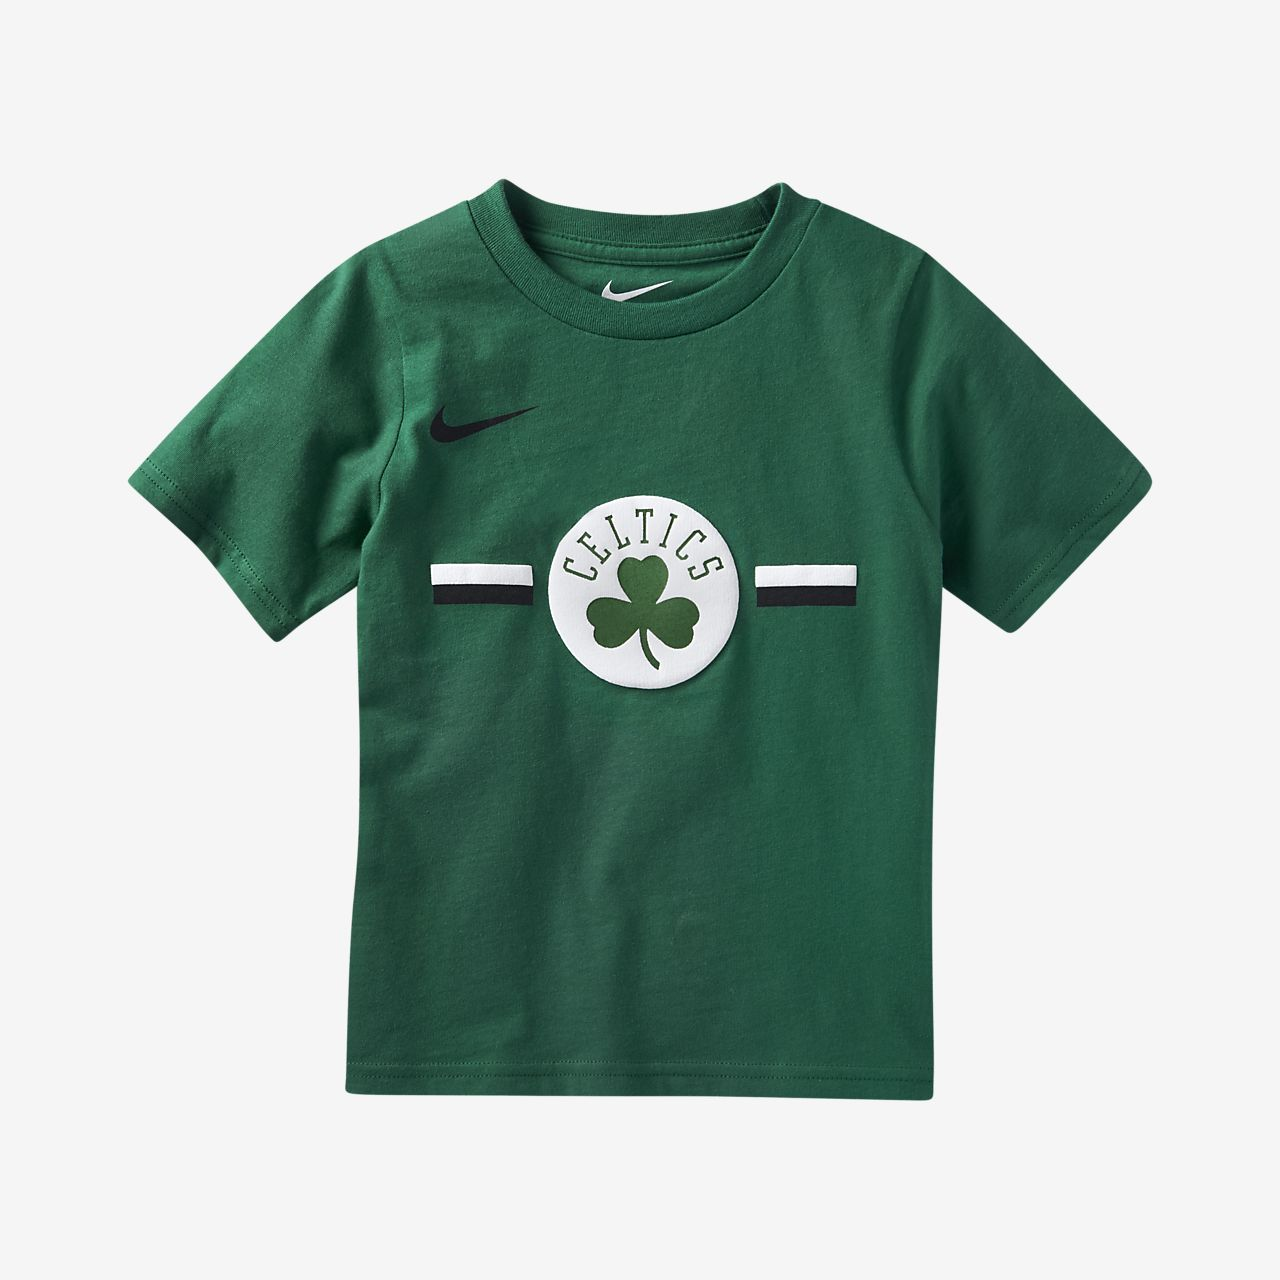 Boston Celtics Nike Logo Toddler NBA T-Shirt